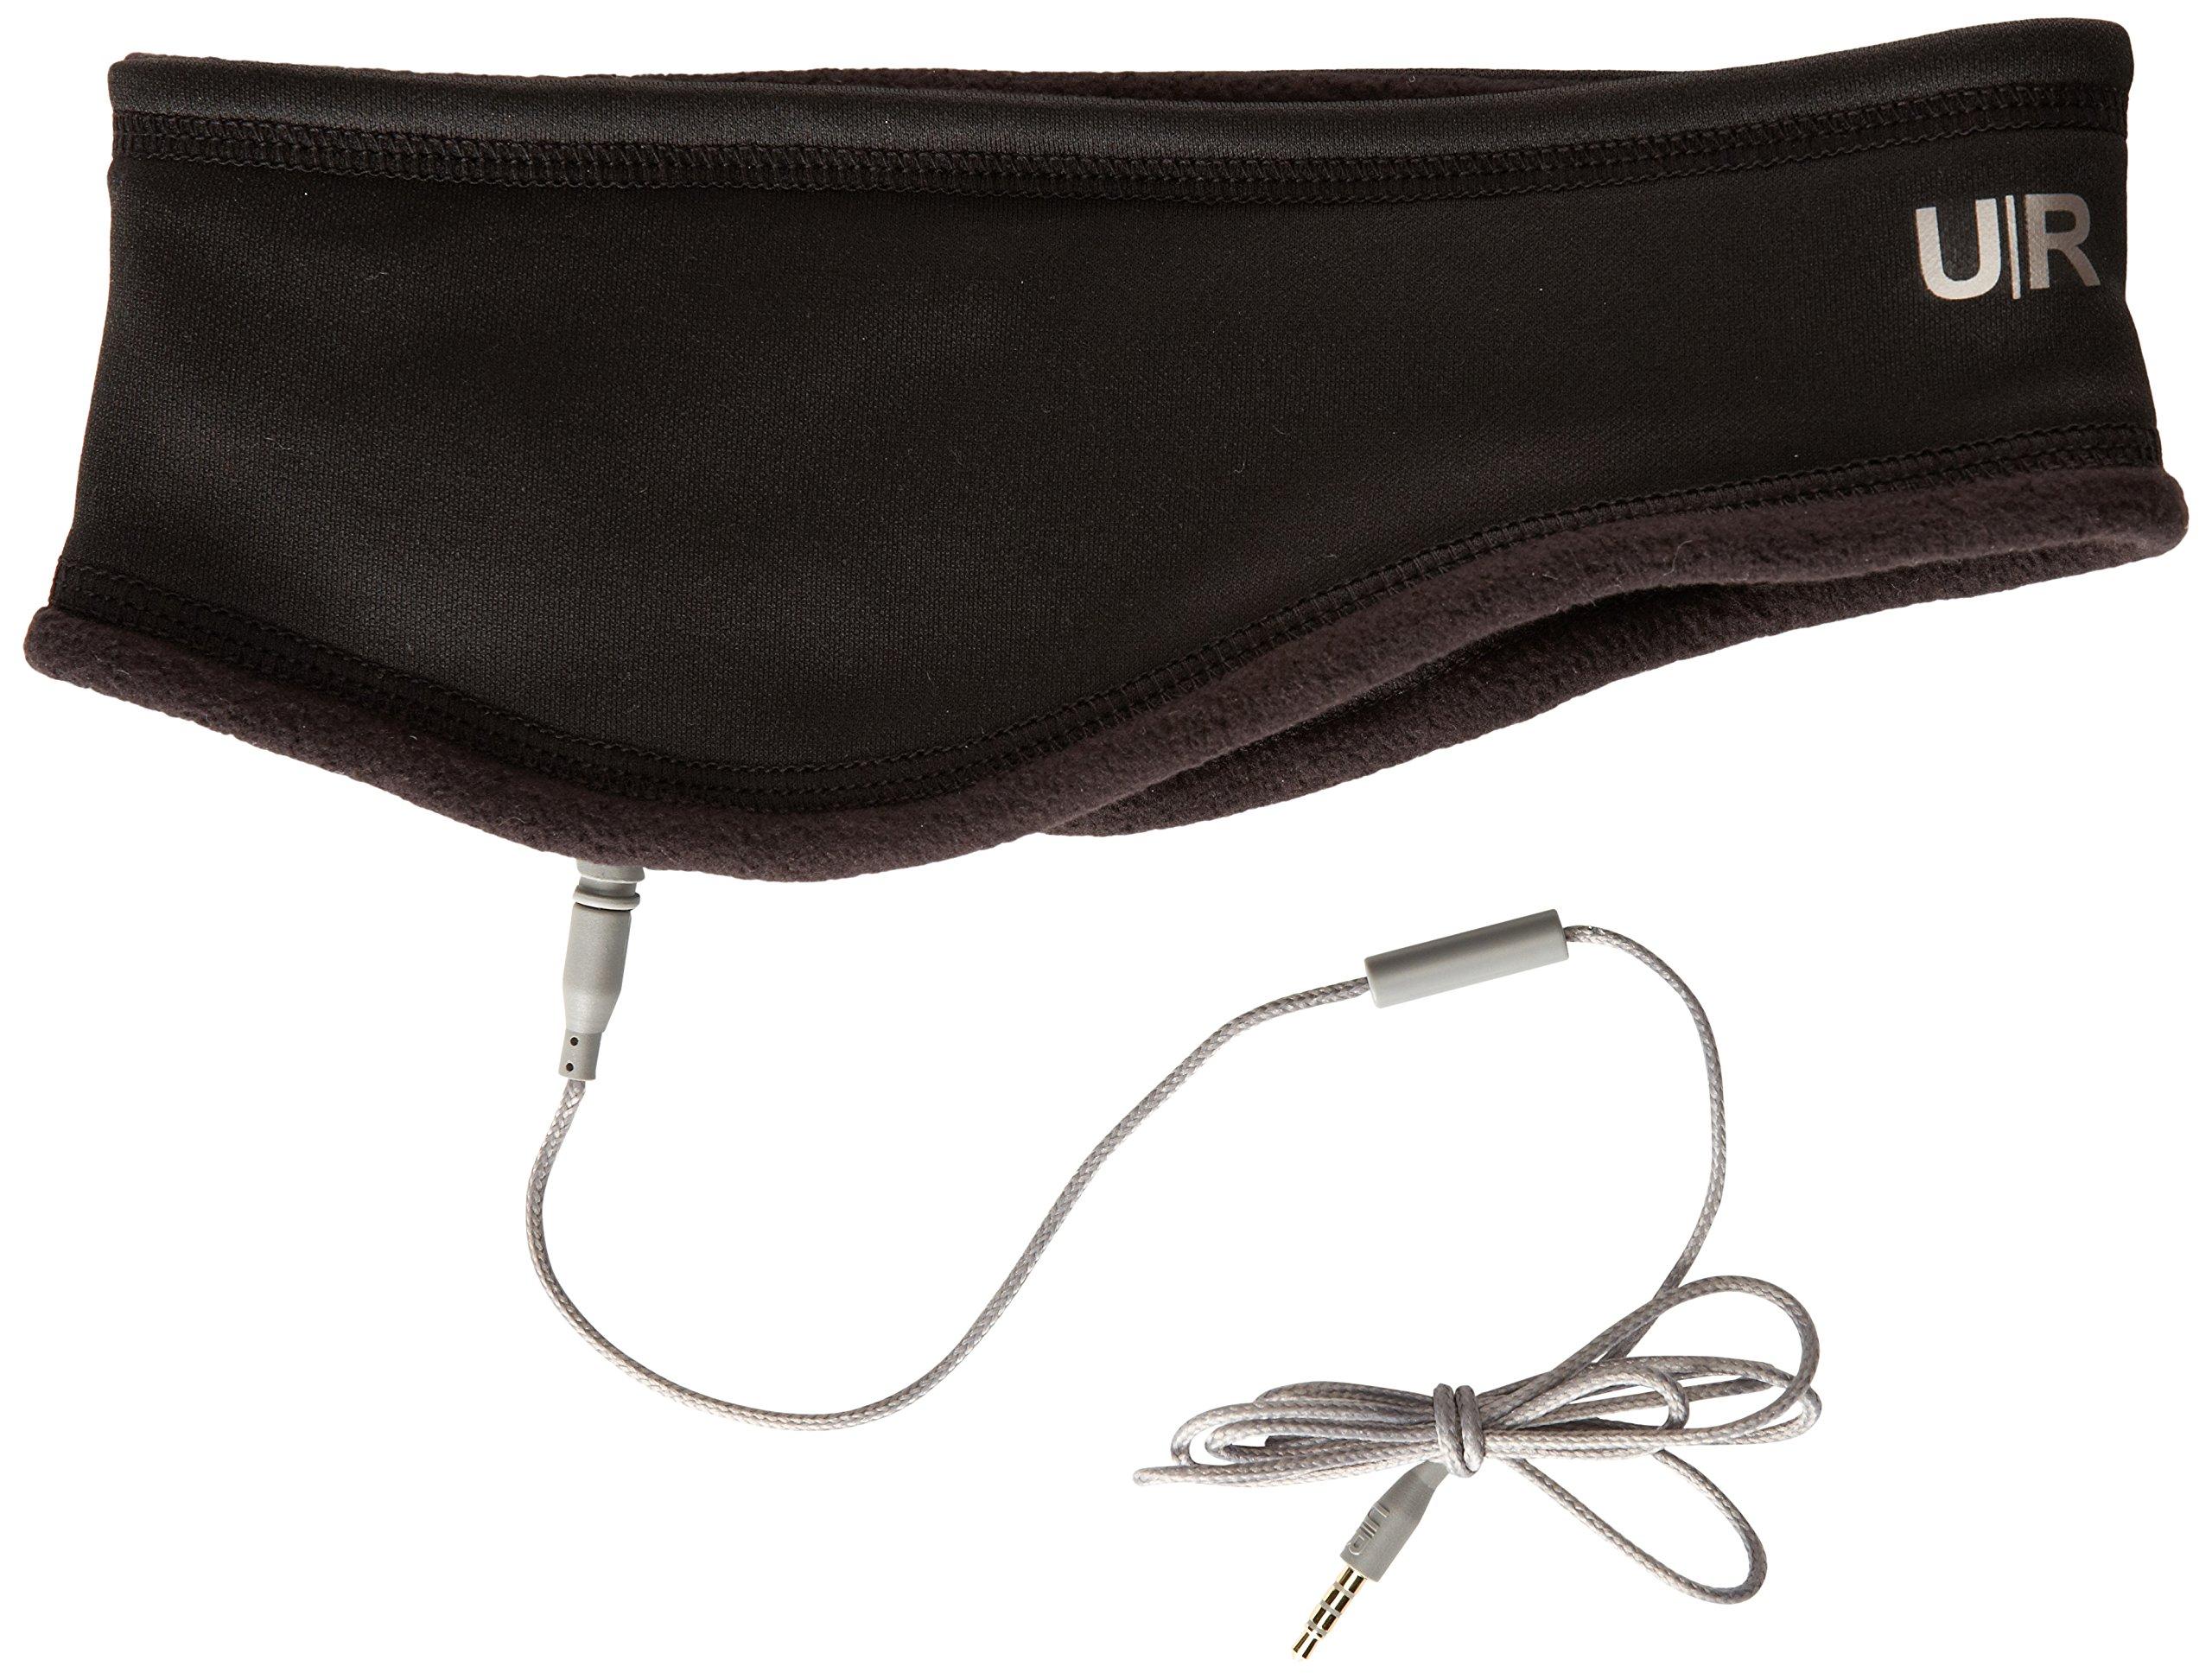 U|R Men's Cole Ative Stretch Audio Headband, Black, One Size